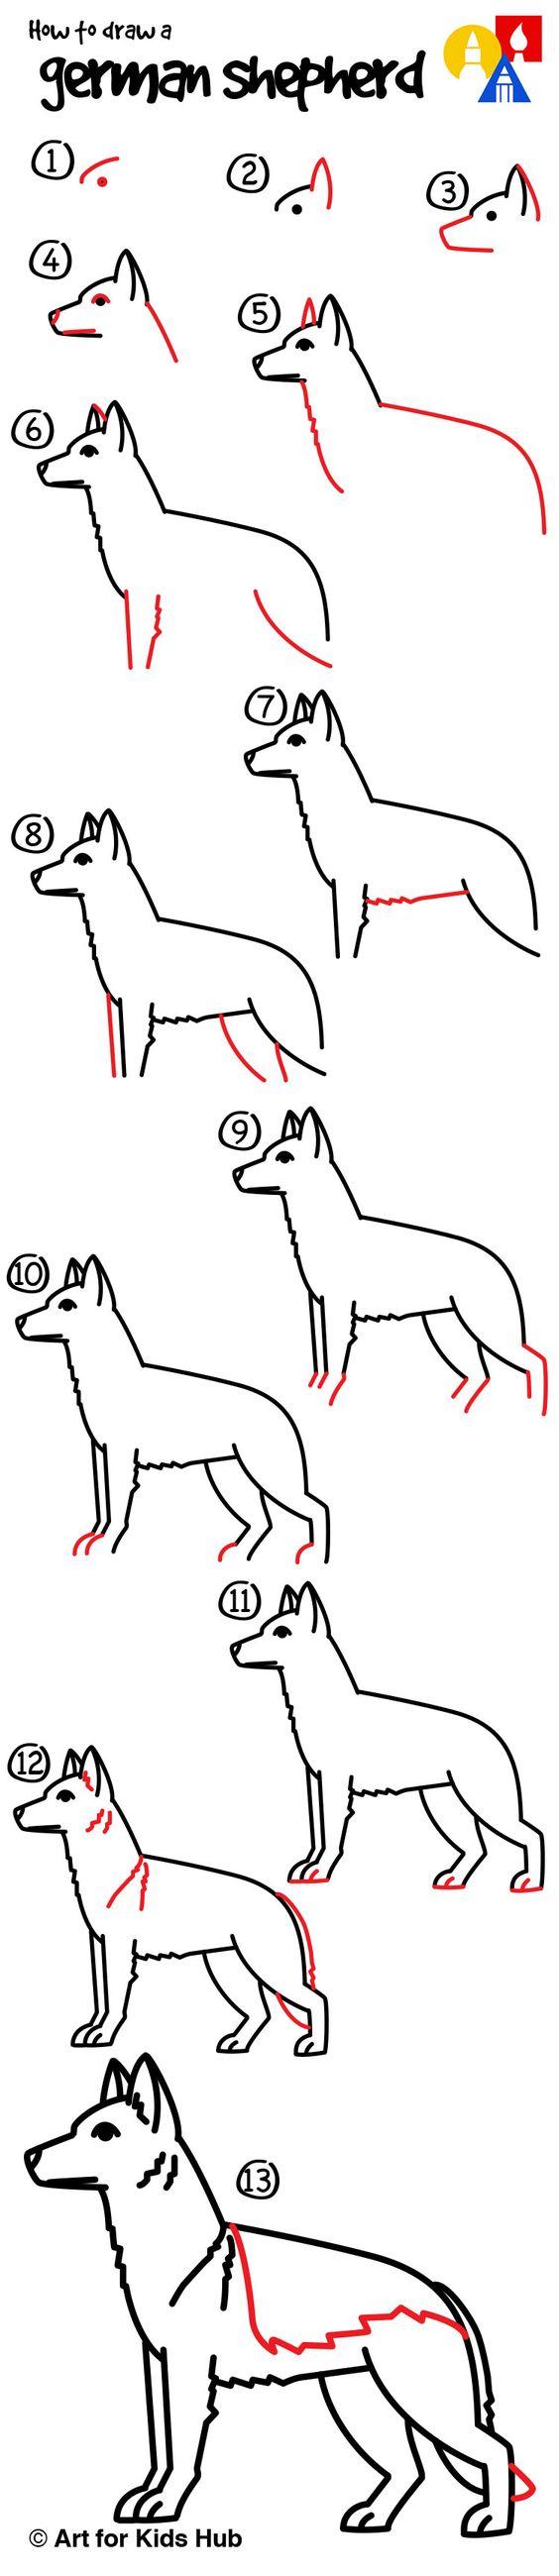 how to draw a german shepherd art for kids hub